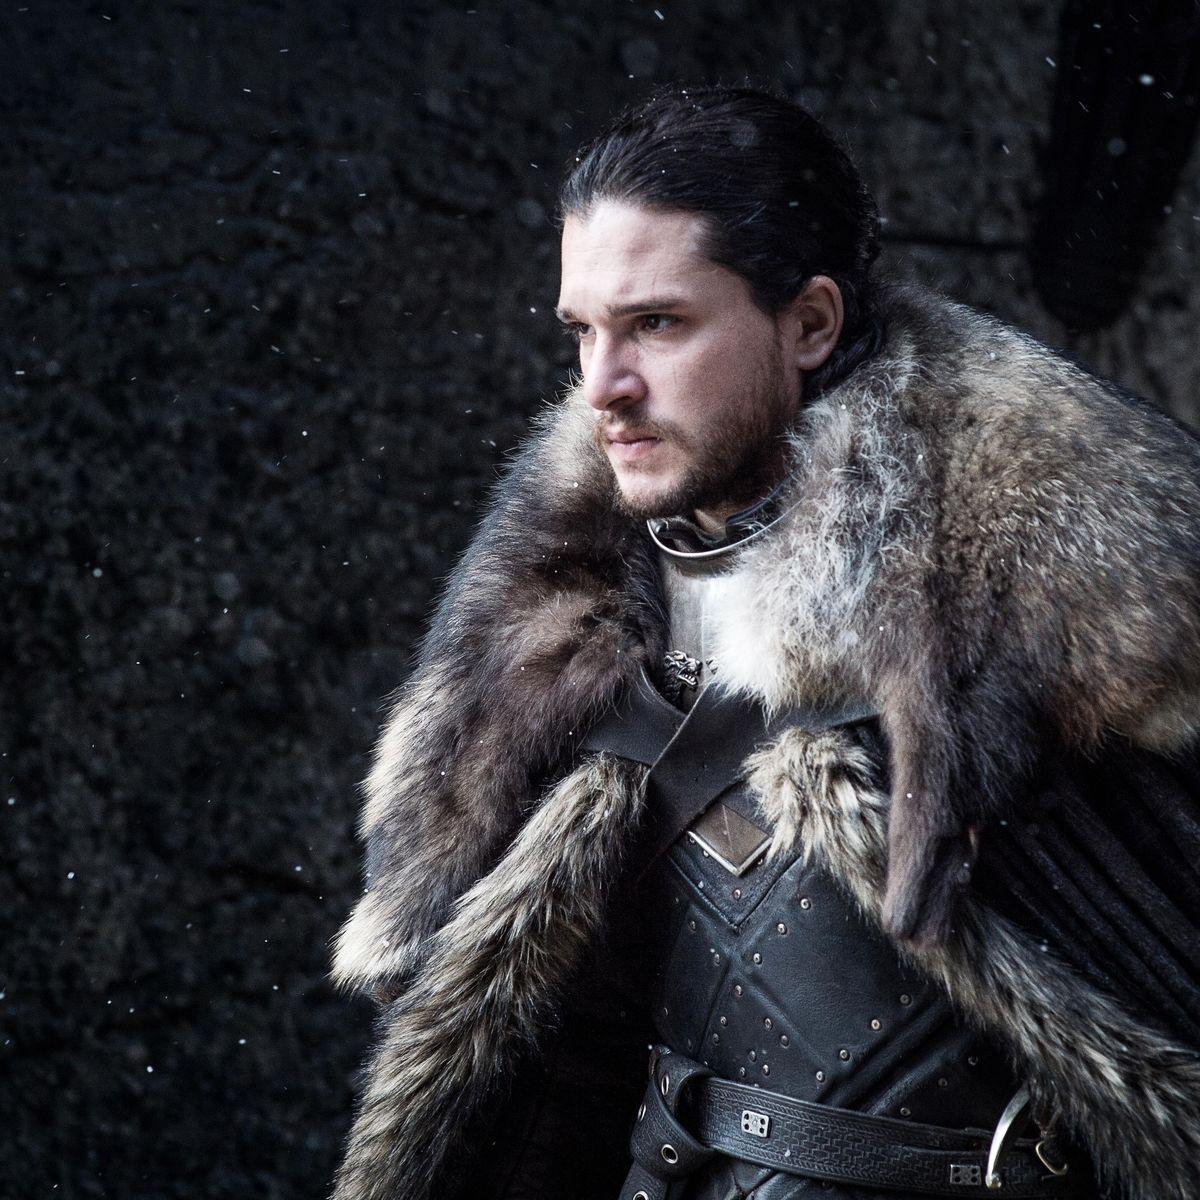 Jon-Snow-Game-of-Thrones-Season-7.jpg